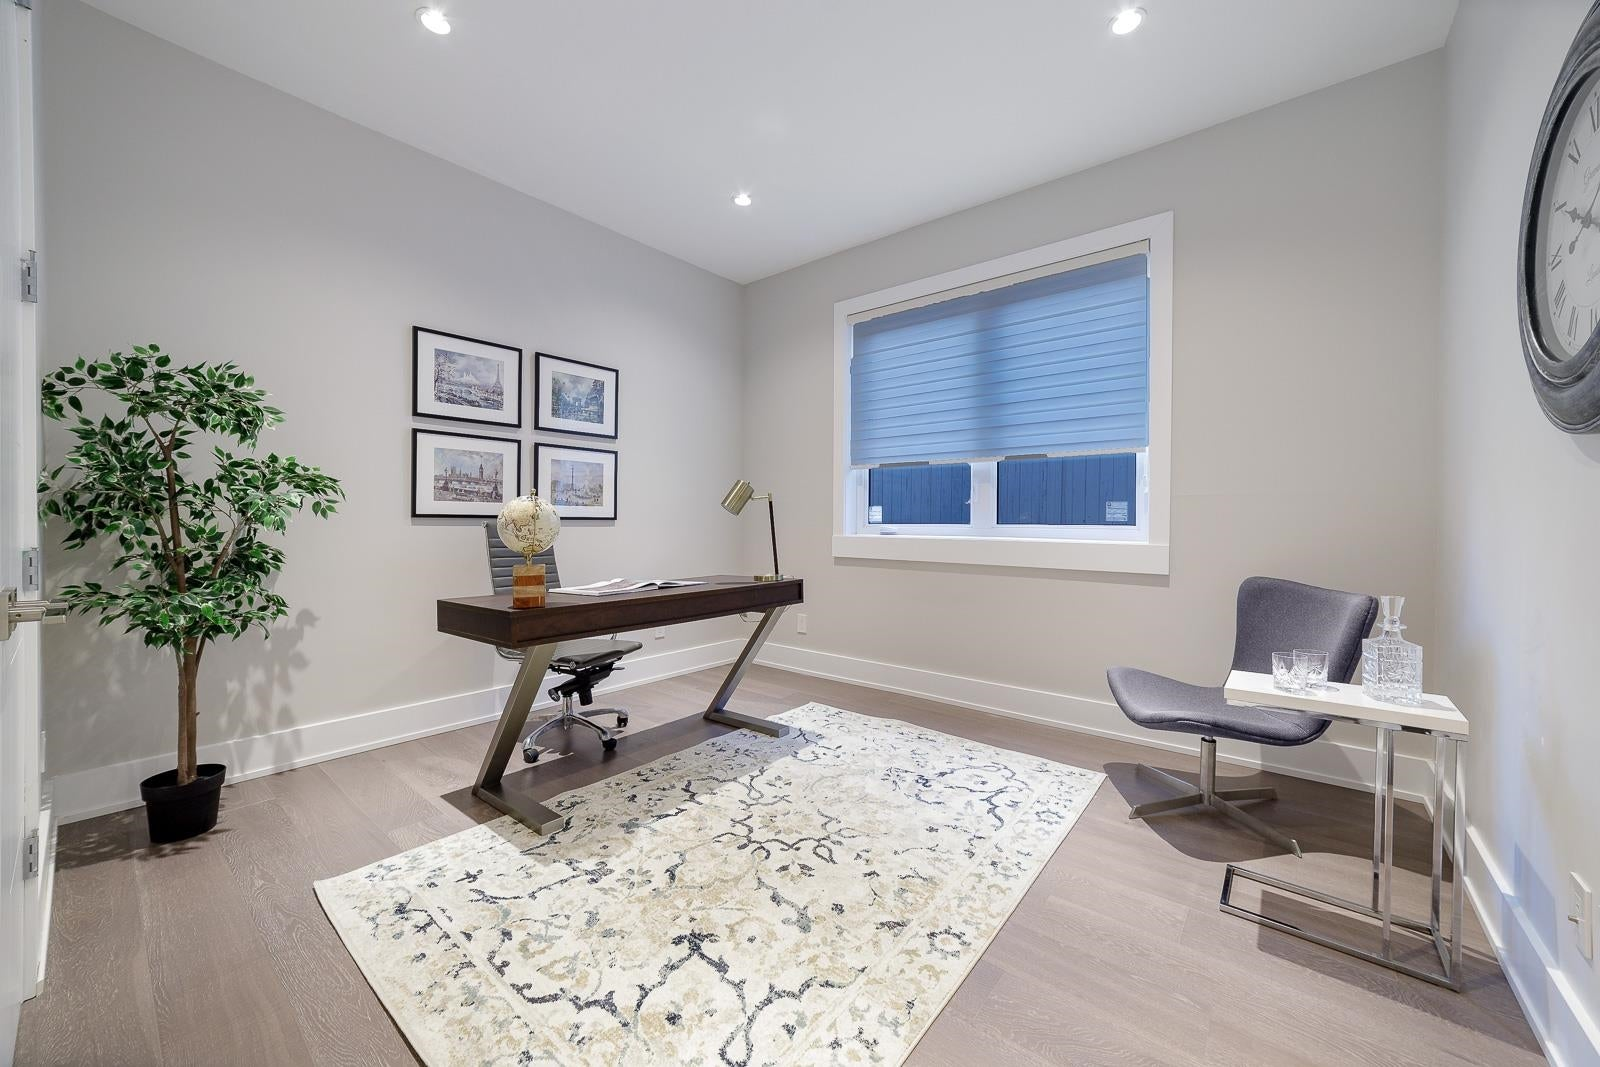 517 GRANADA CRESCENT - Upper Delbrook House/Single Family for sale, 8 Bedrooms (R2615057) - #11